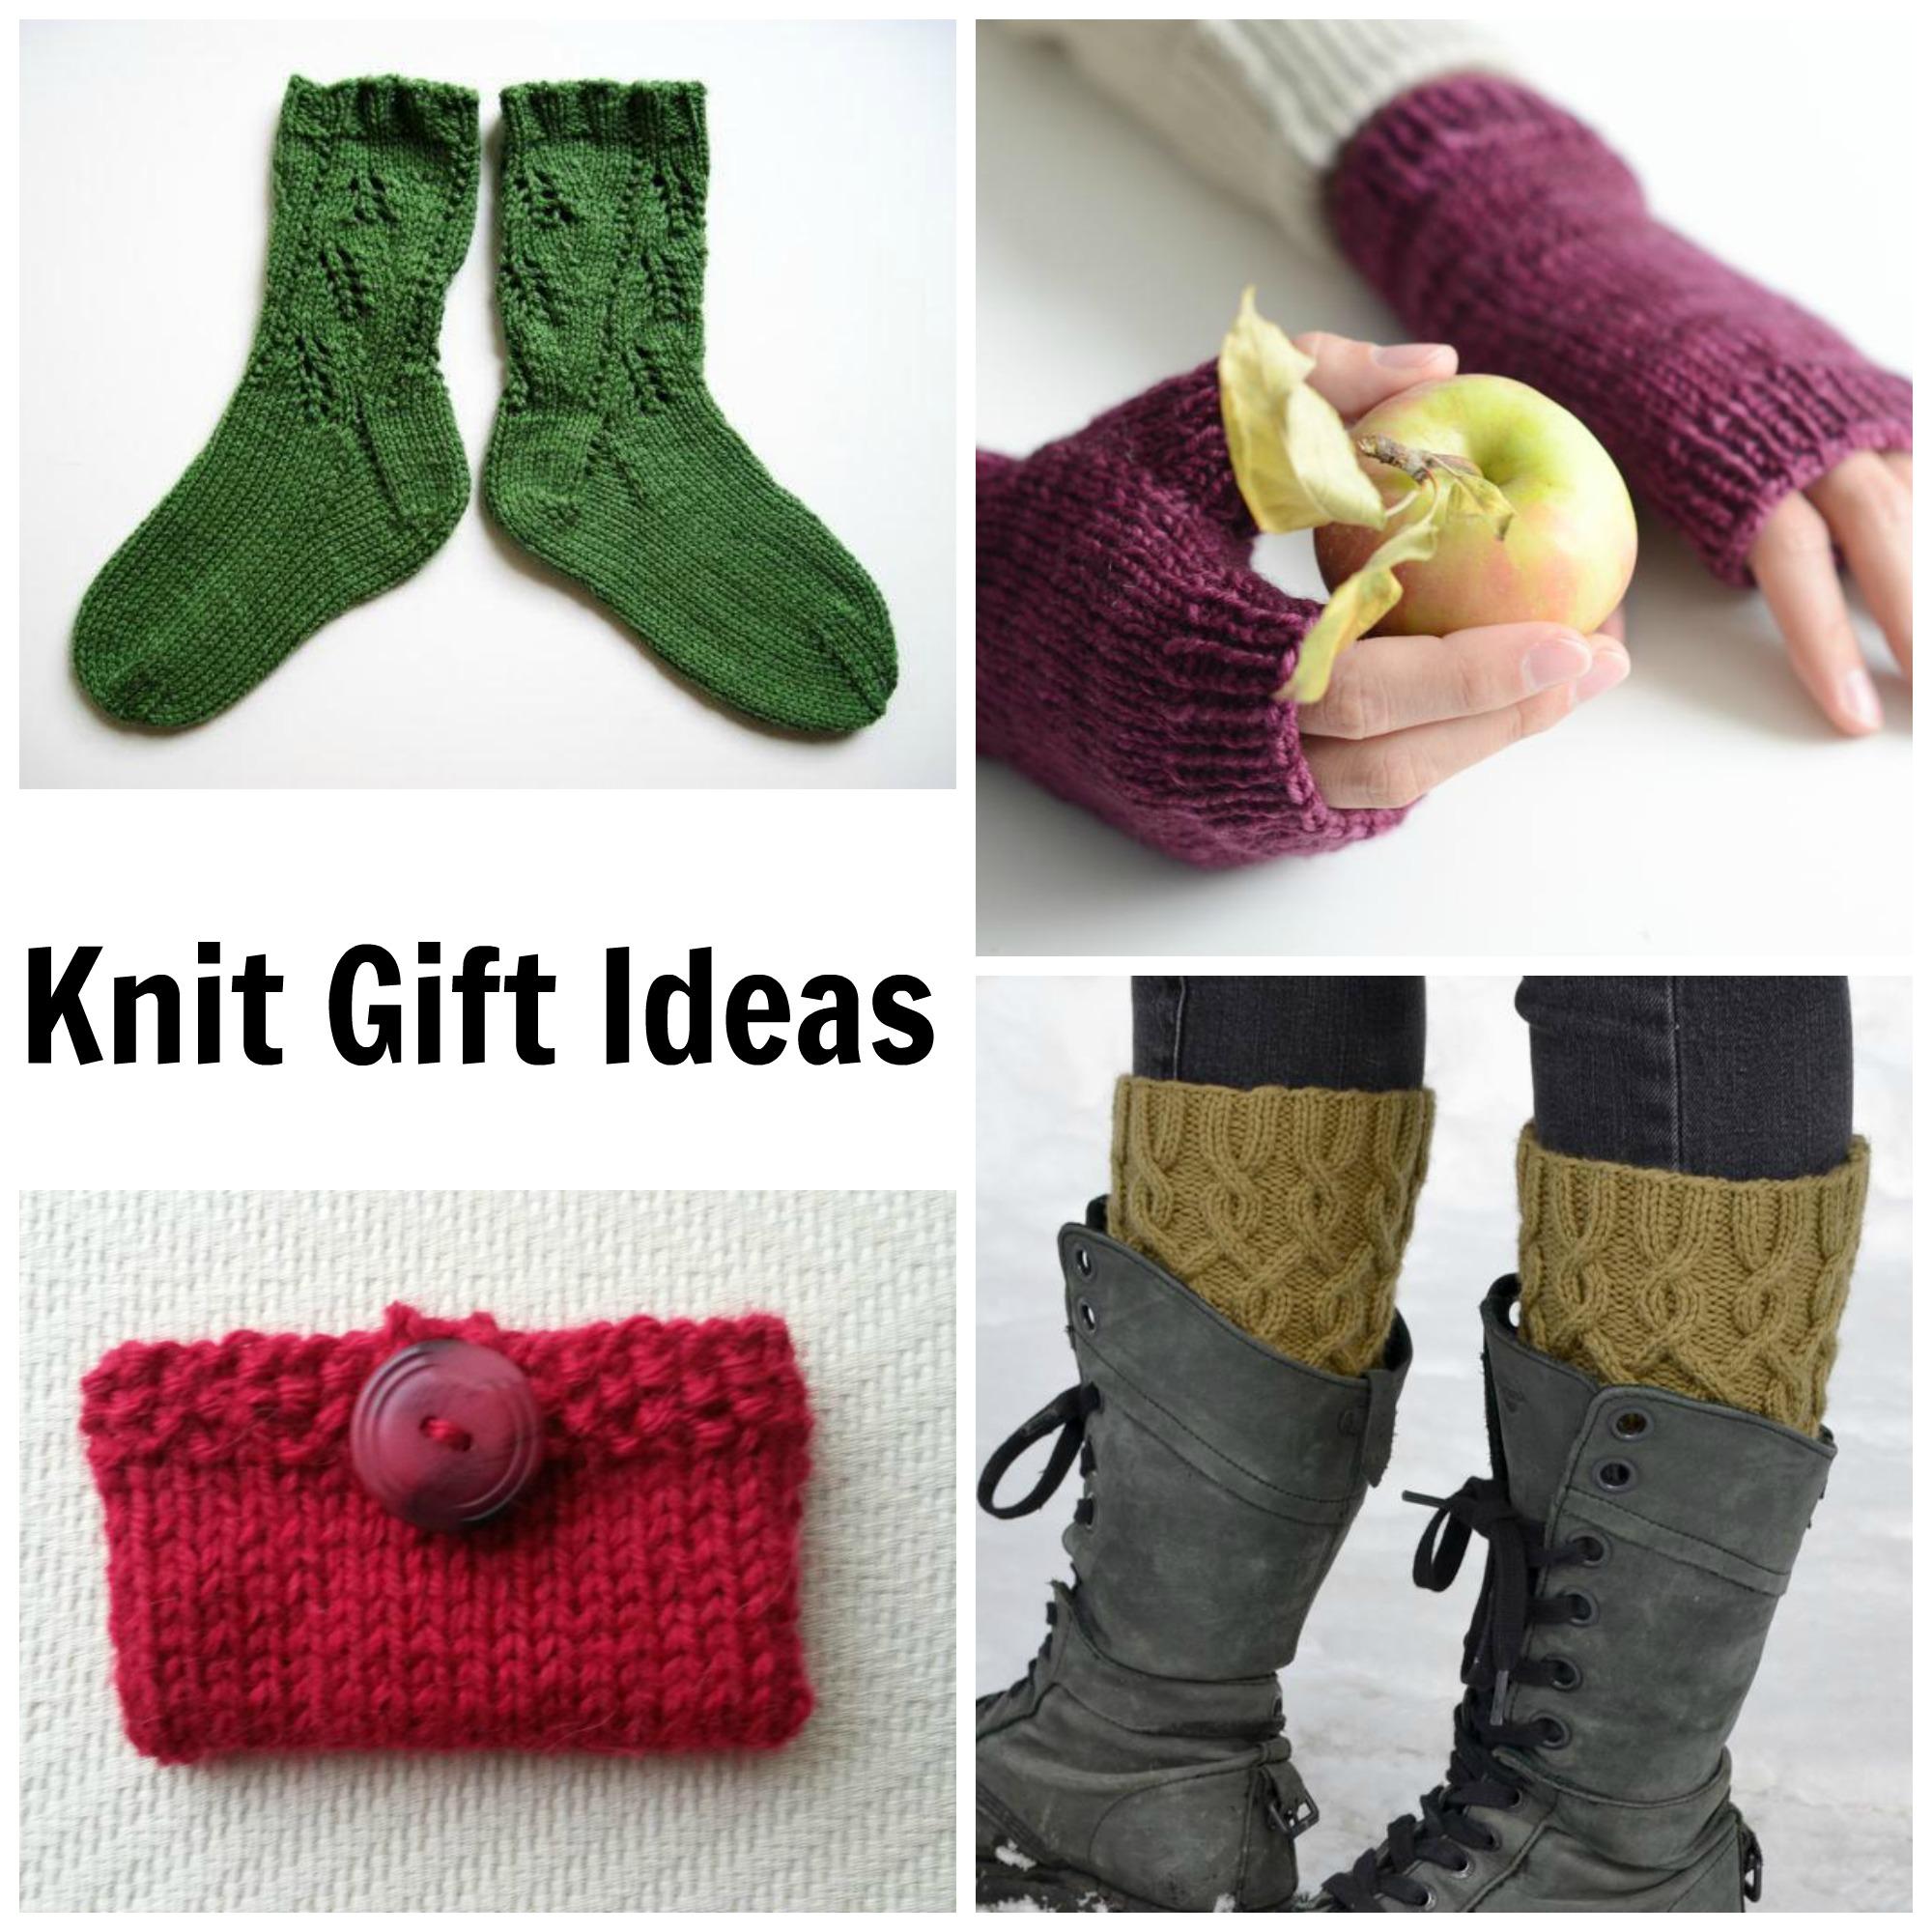 Knit Gift Ideas